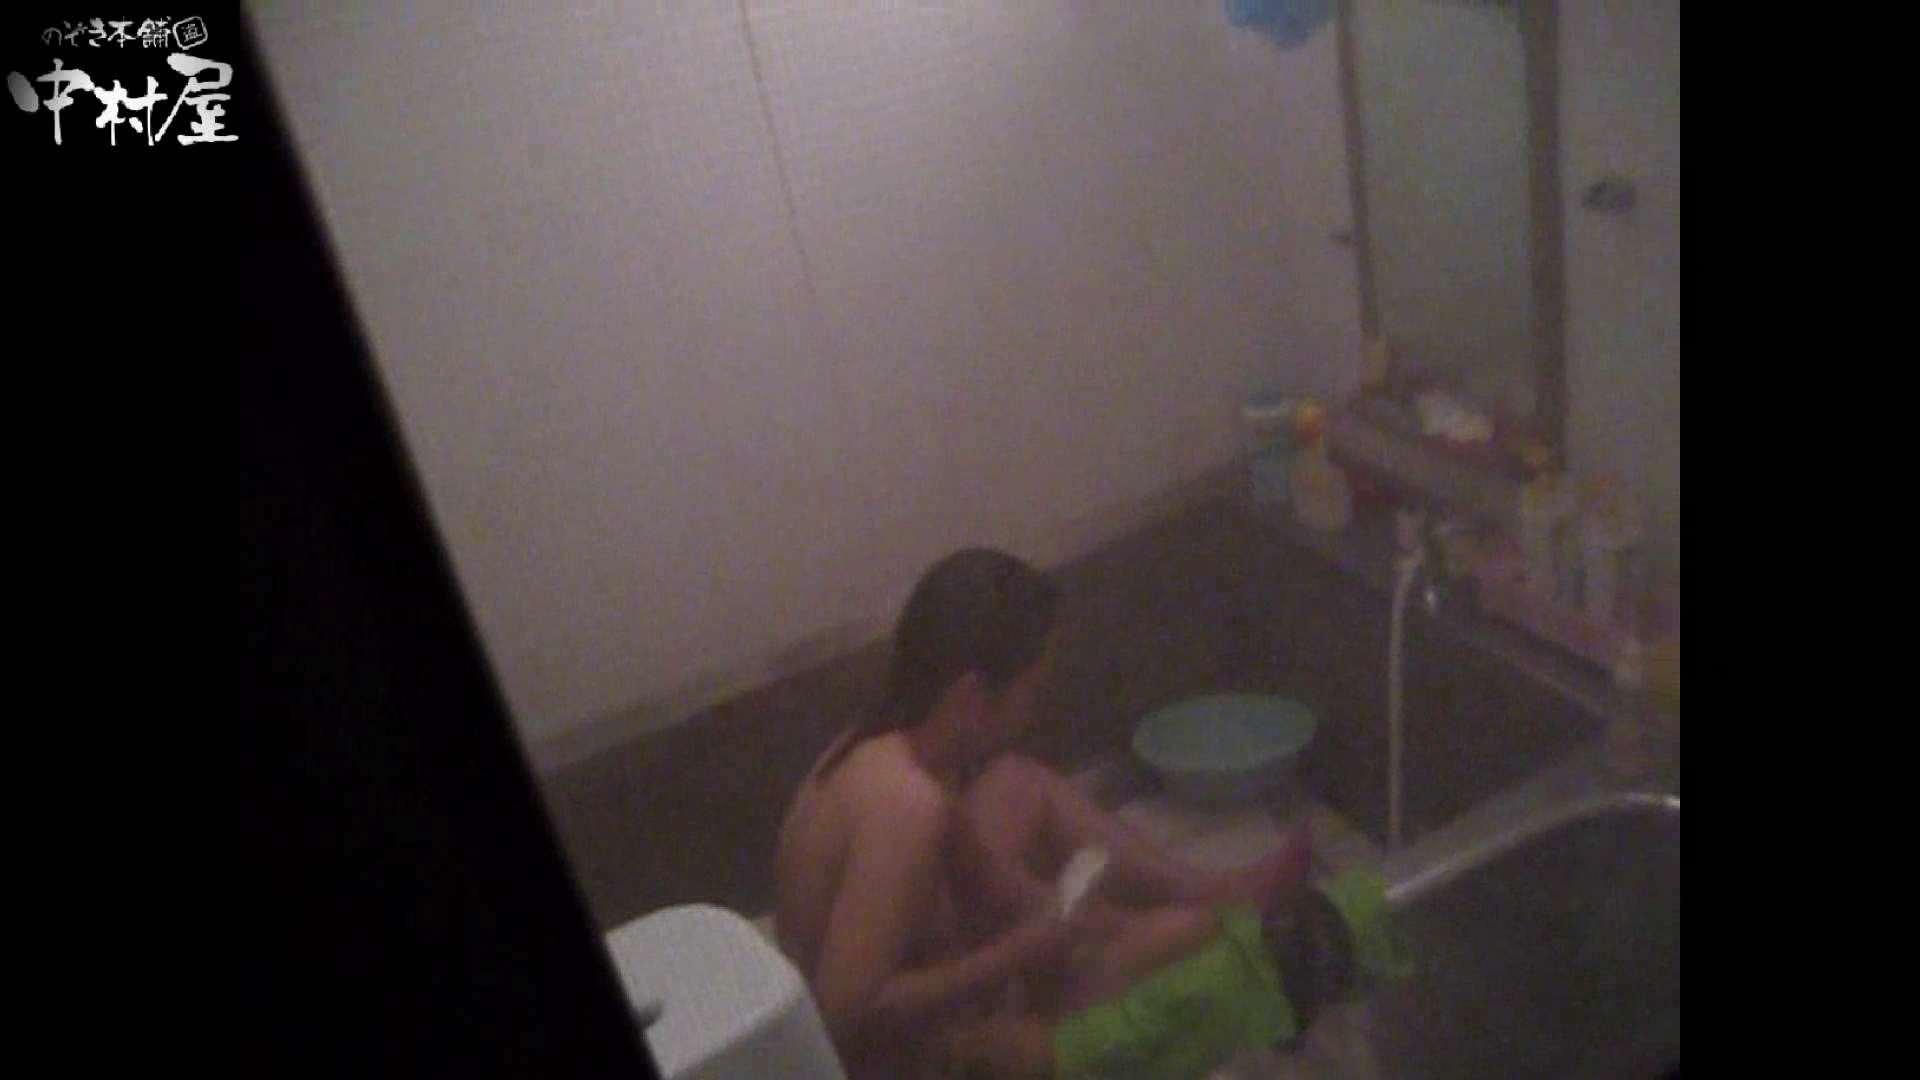 民家風呂専門盗撮師の超危険映像 vol.020 OLのエロ生活   盗撮  57連発 25